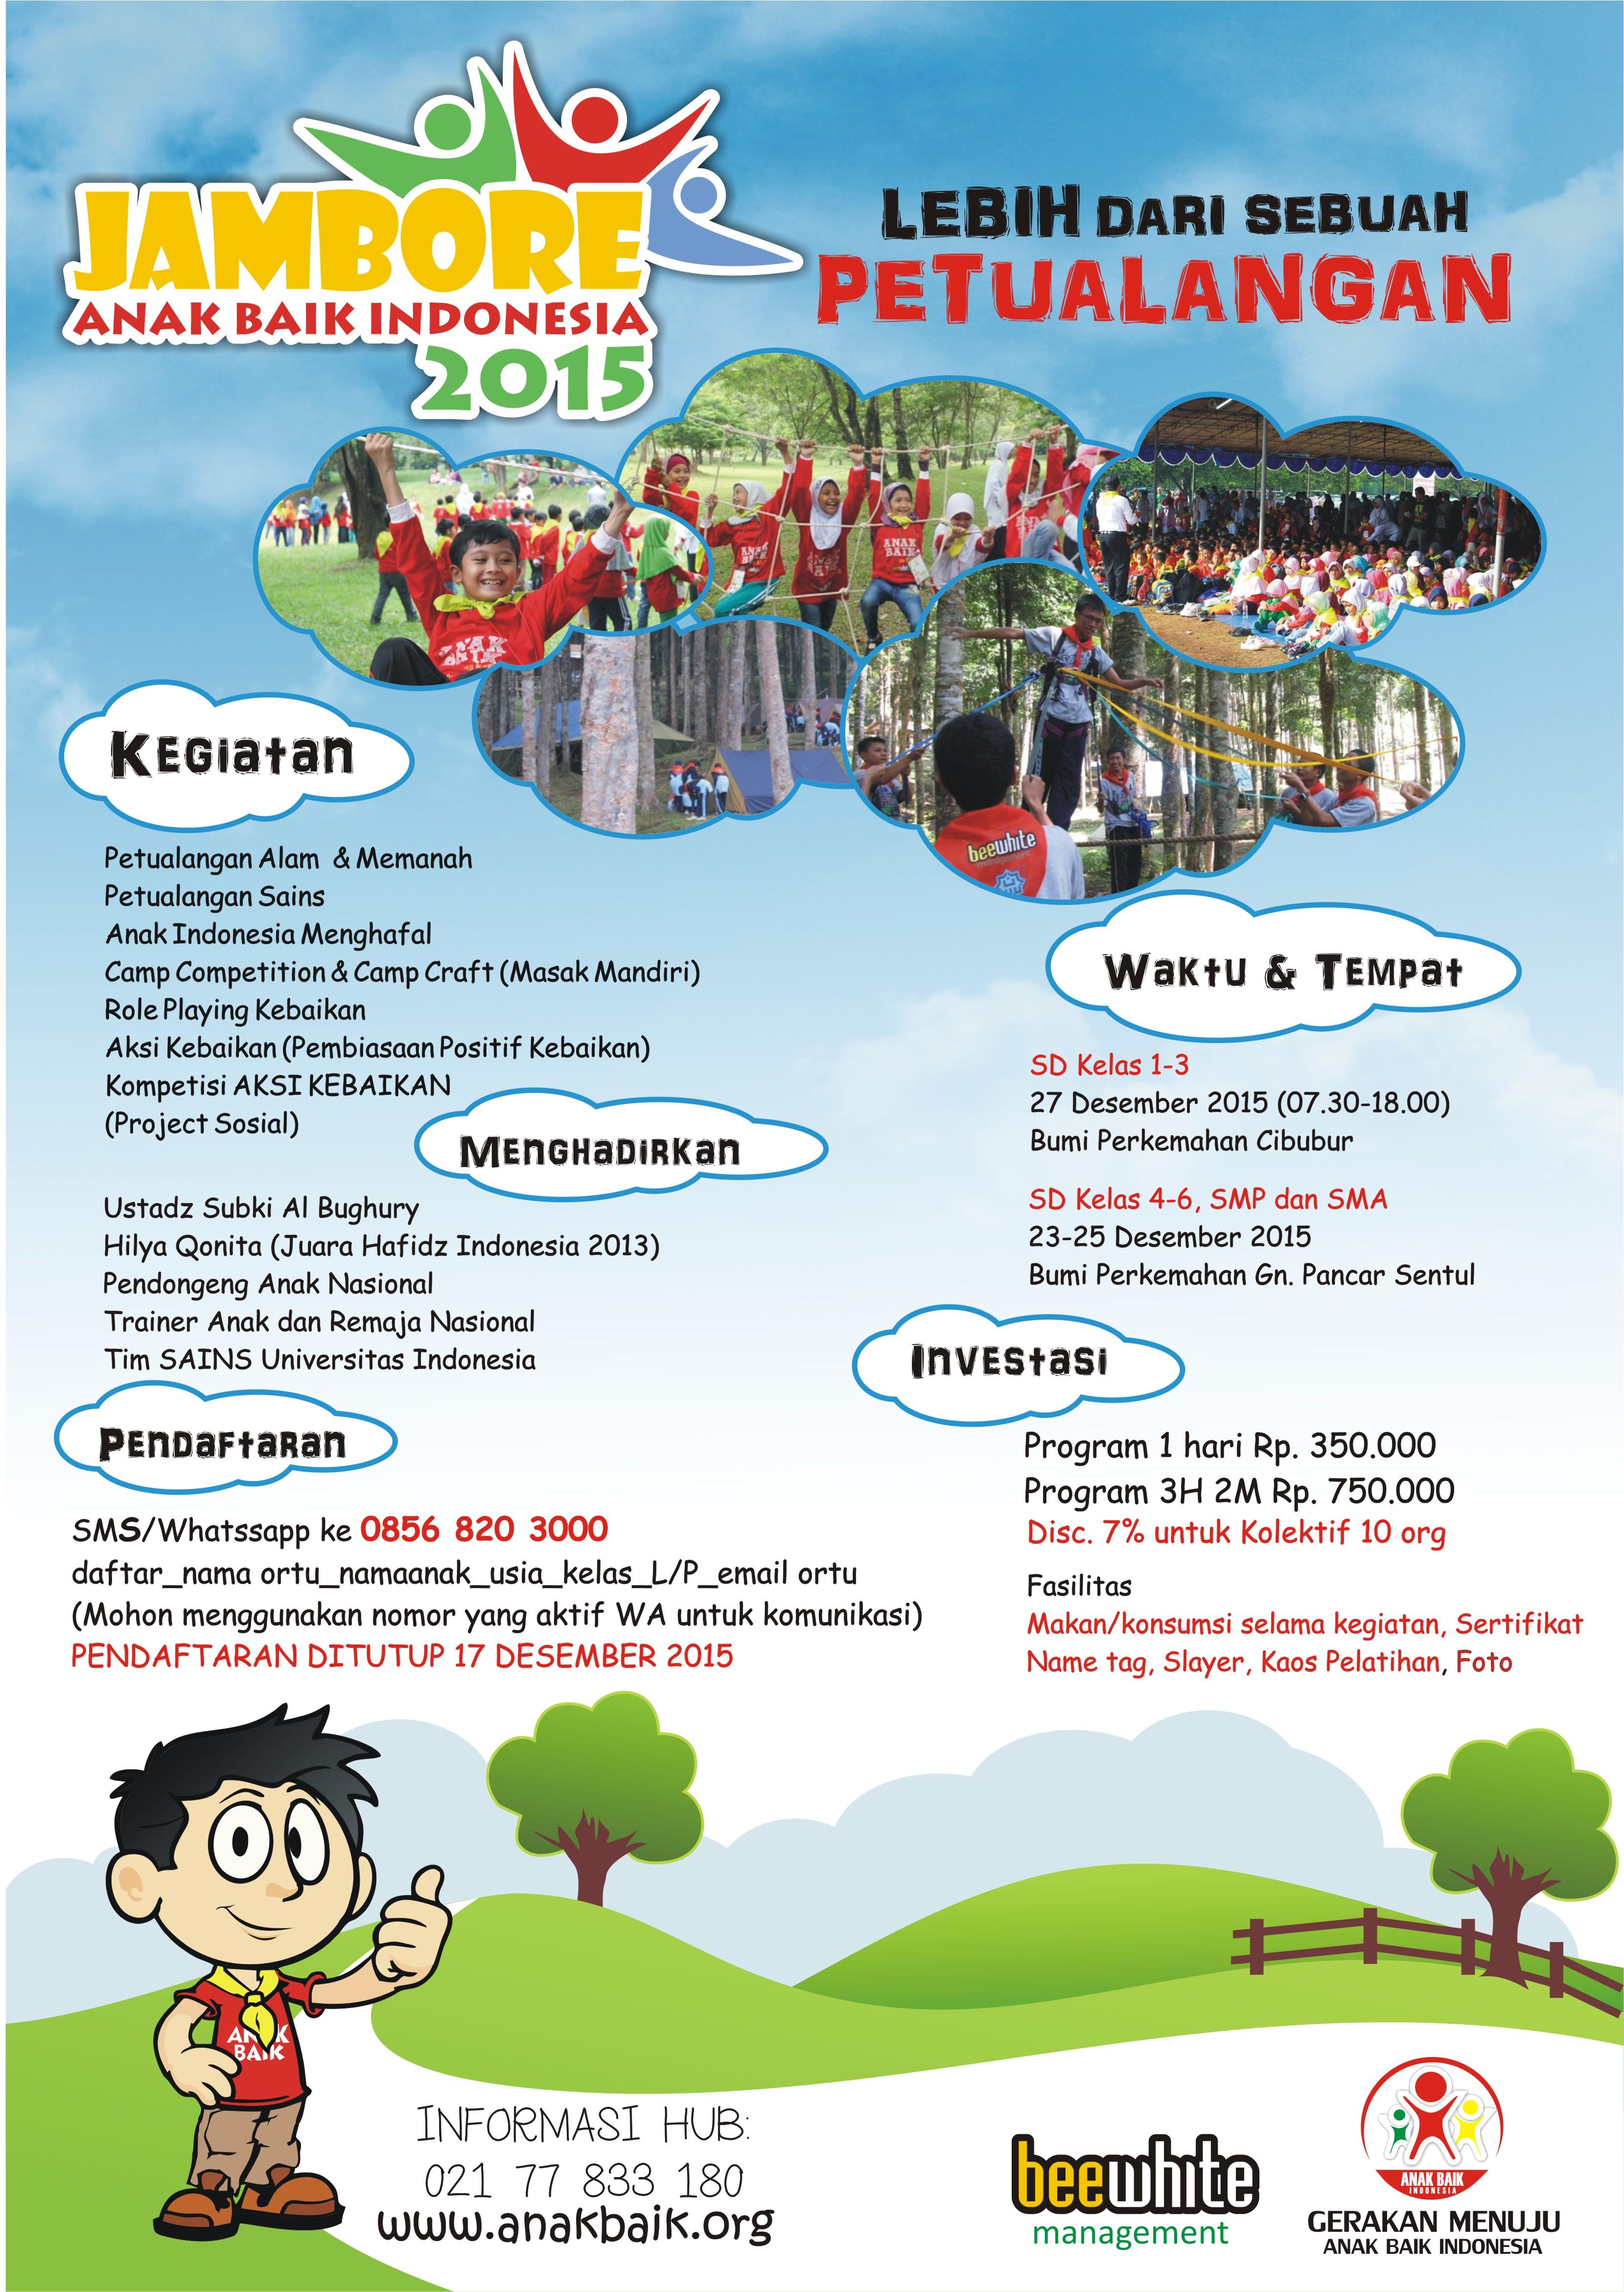 Jambore Anak Baik 2015